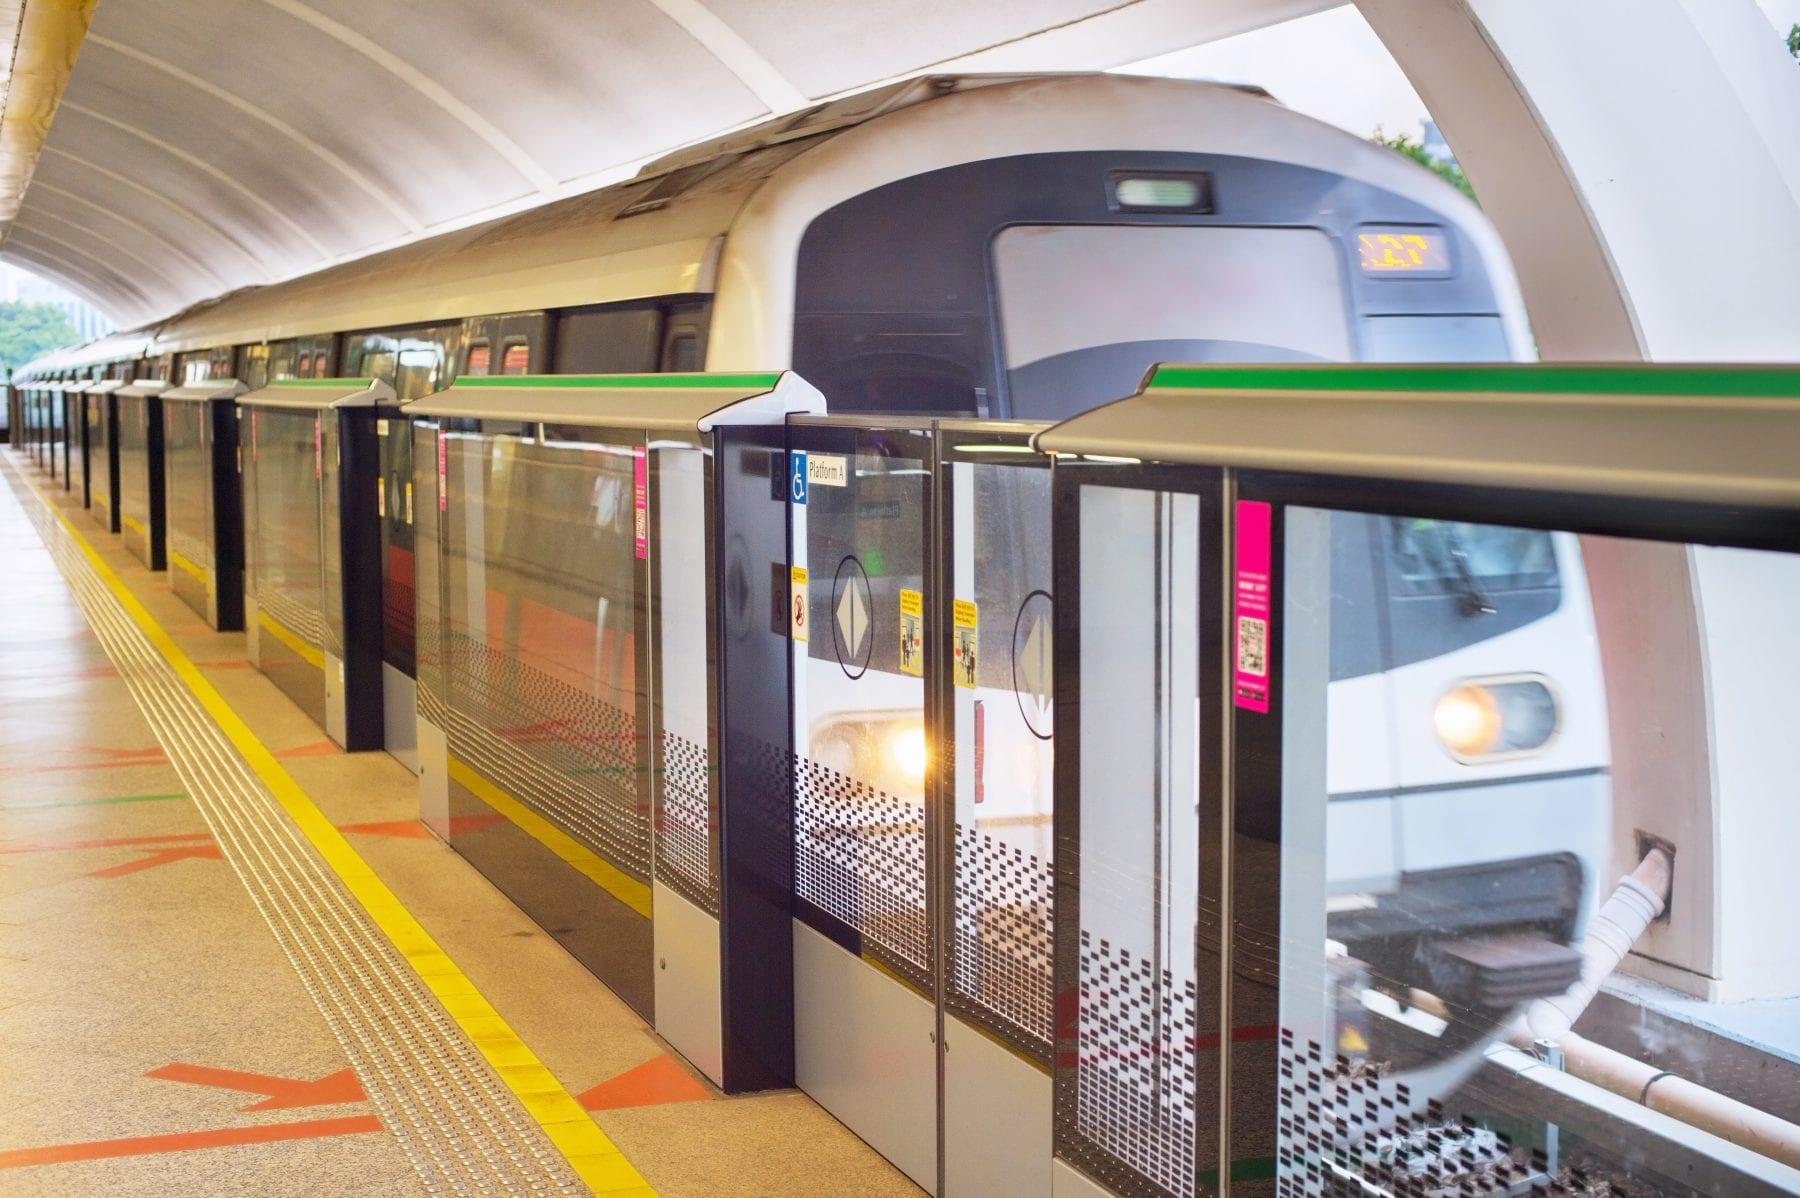 SUCCESSFUL ASSET RENEWAL PROGRAM KEEPS RAIL OPERATIONS ON TRACK